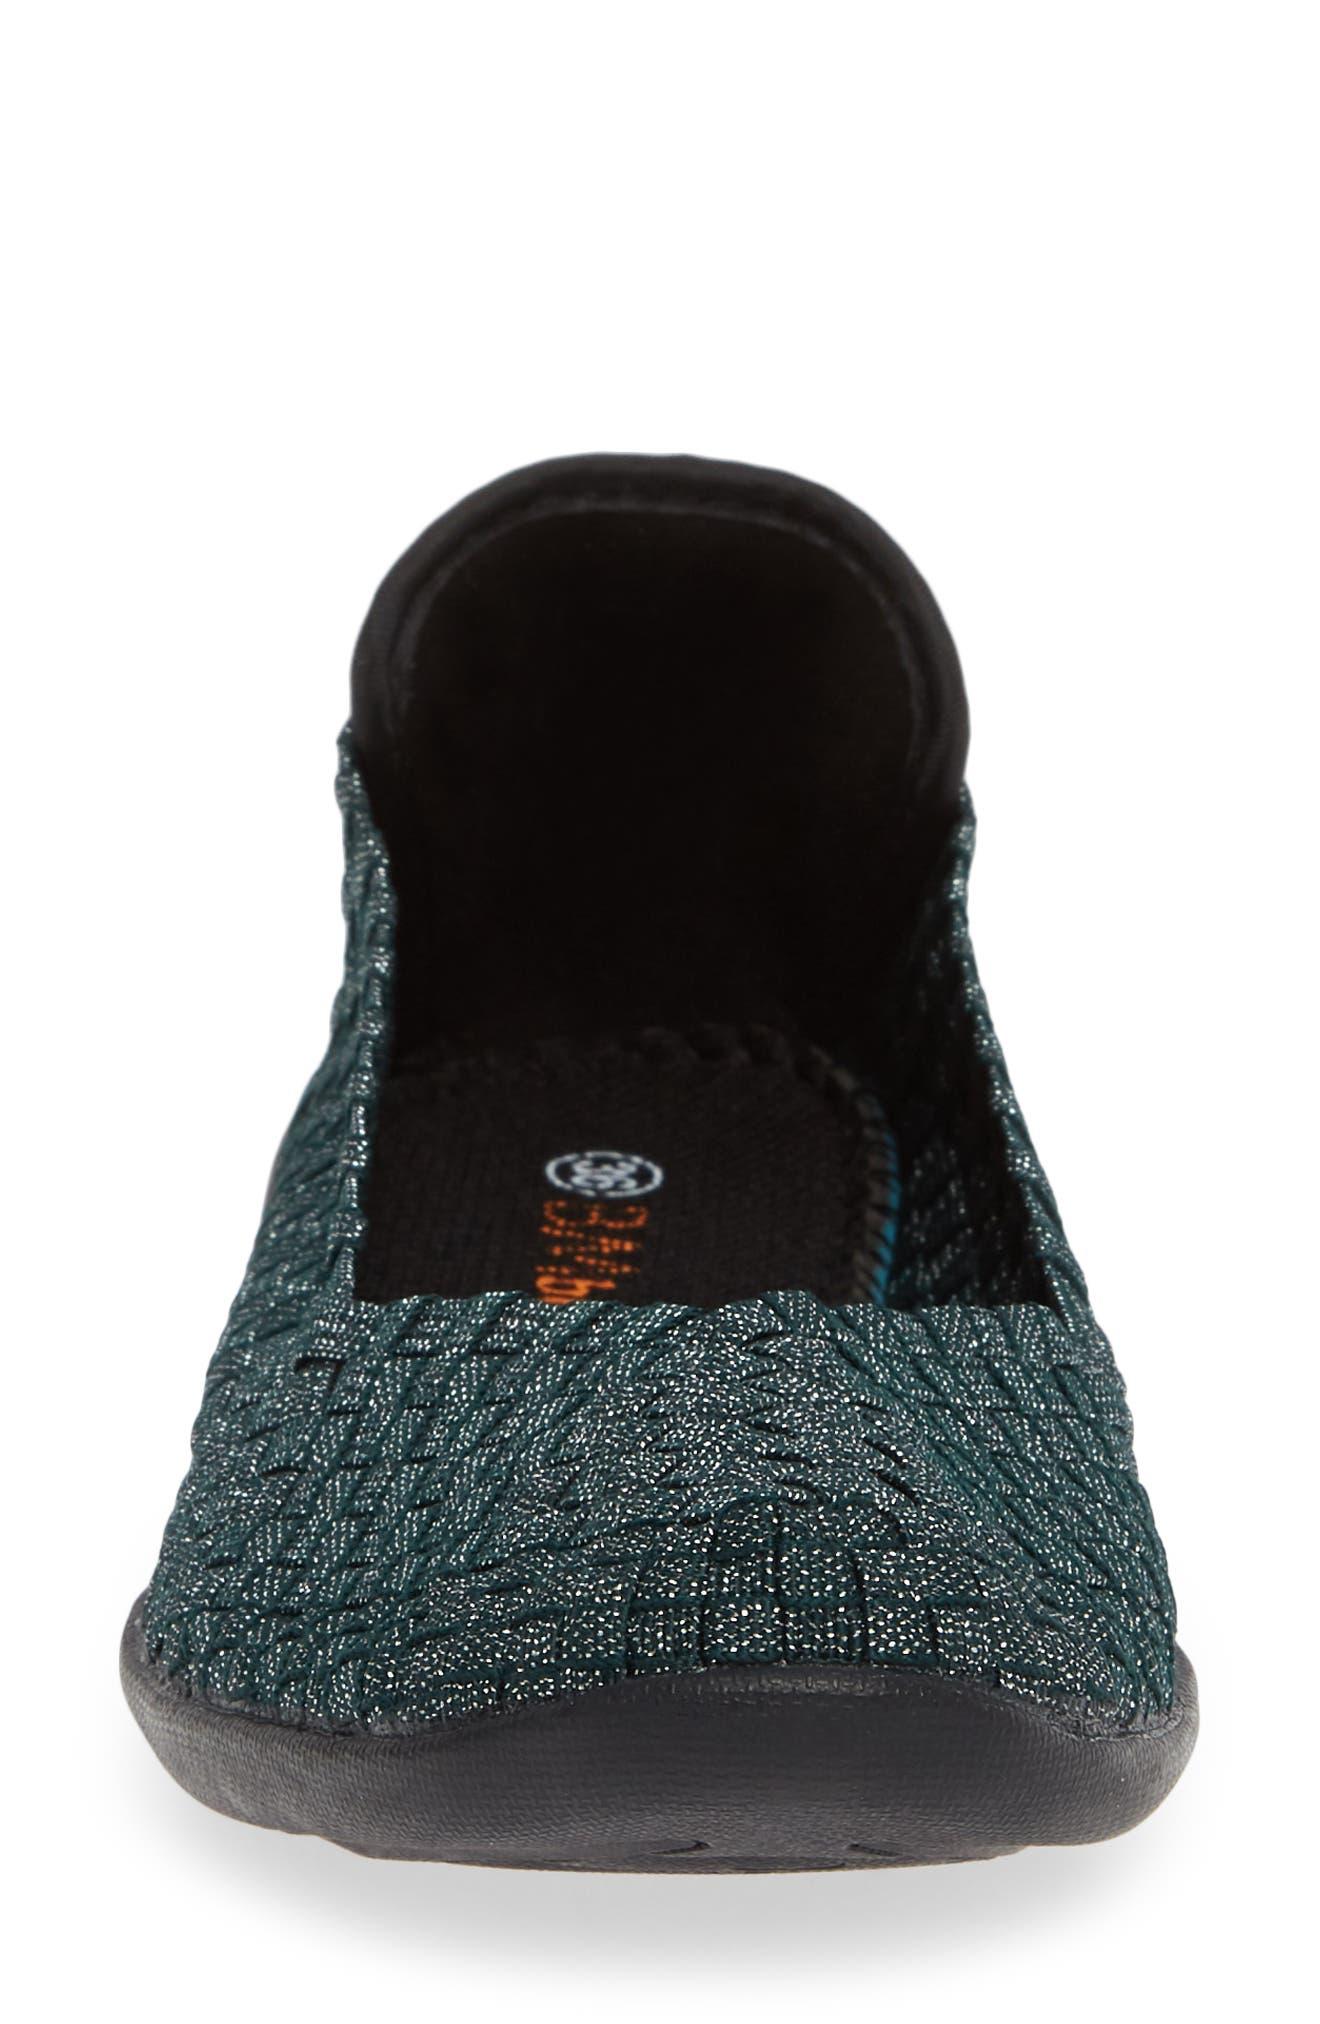 Catwalk Sneaker,                             Alternate thumbnail 4, color,                             DEEP GREEN SHIMMER FABRIC